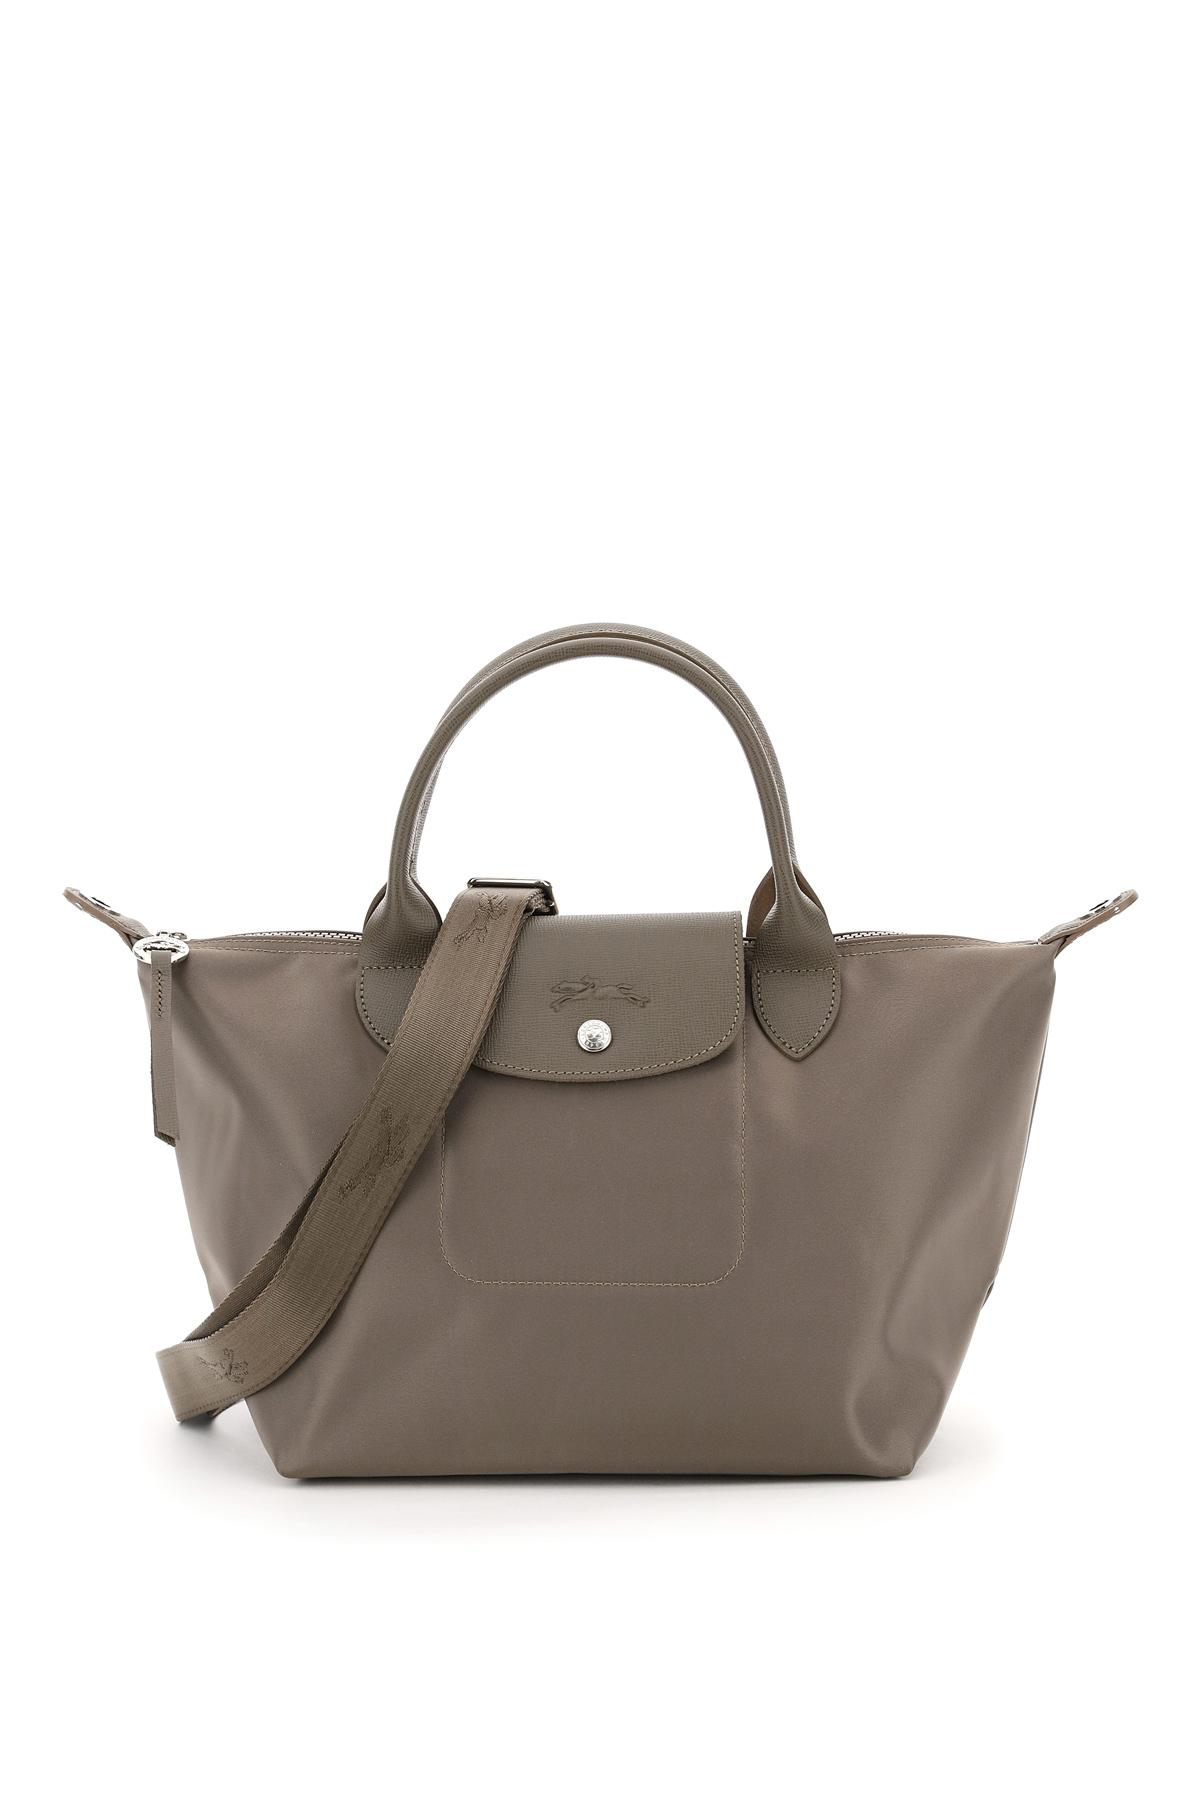 Longchamp shopping le pliage neo small